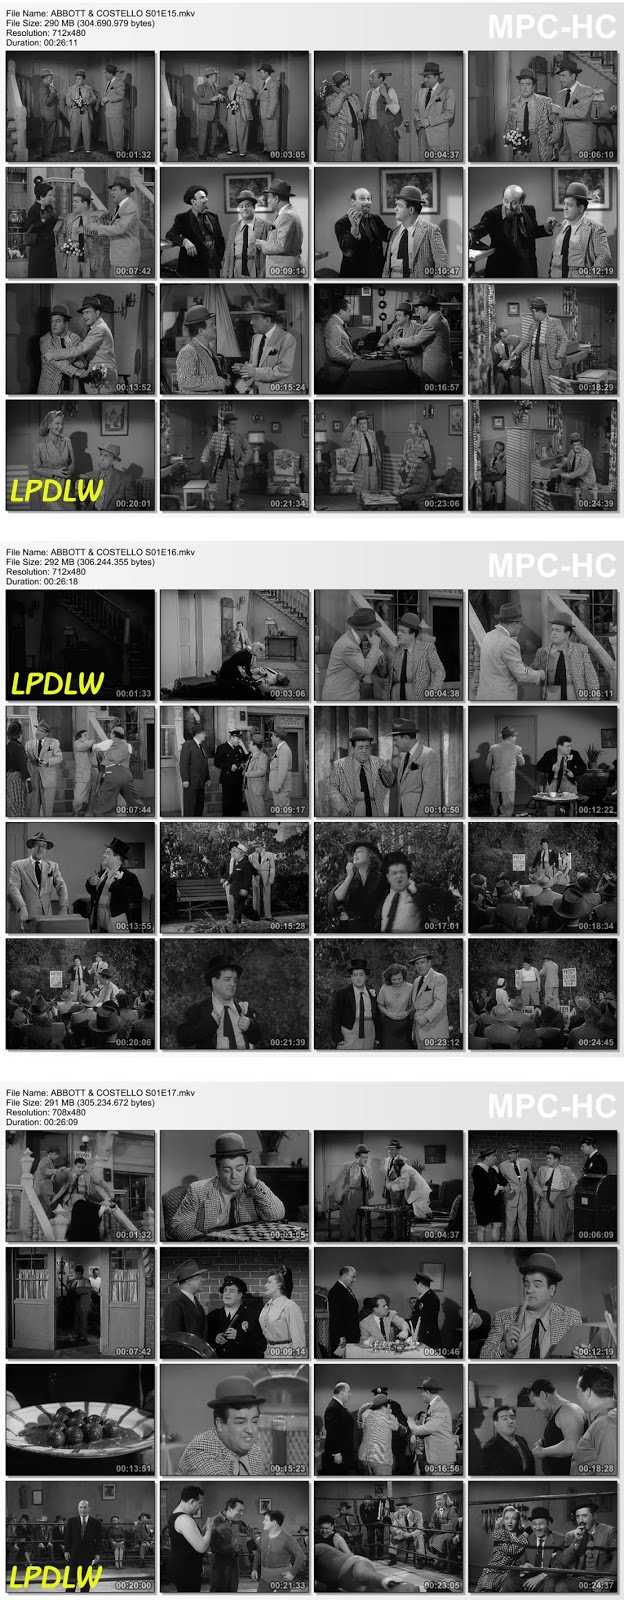 El Show de Abbott y Costello - S01 E15-16-17-18-19-20